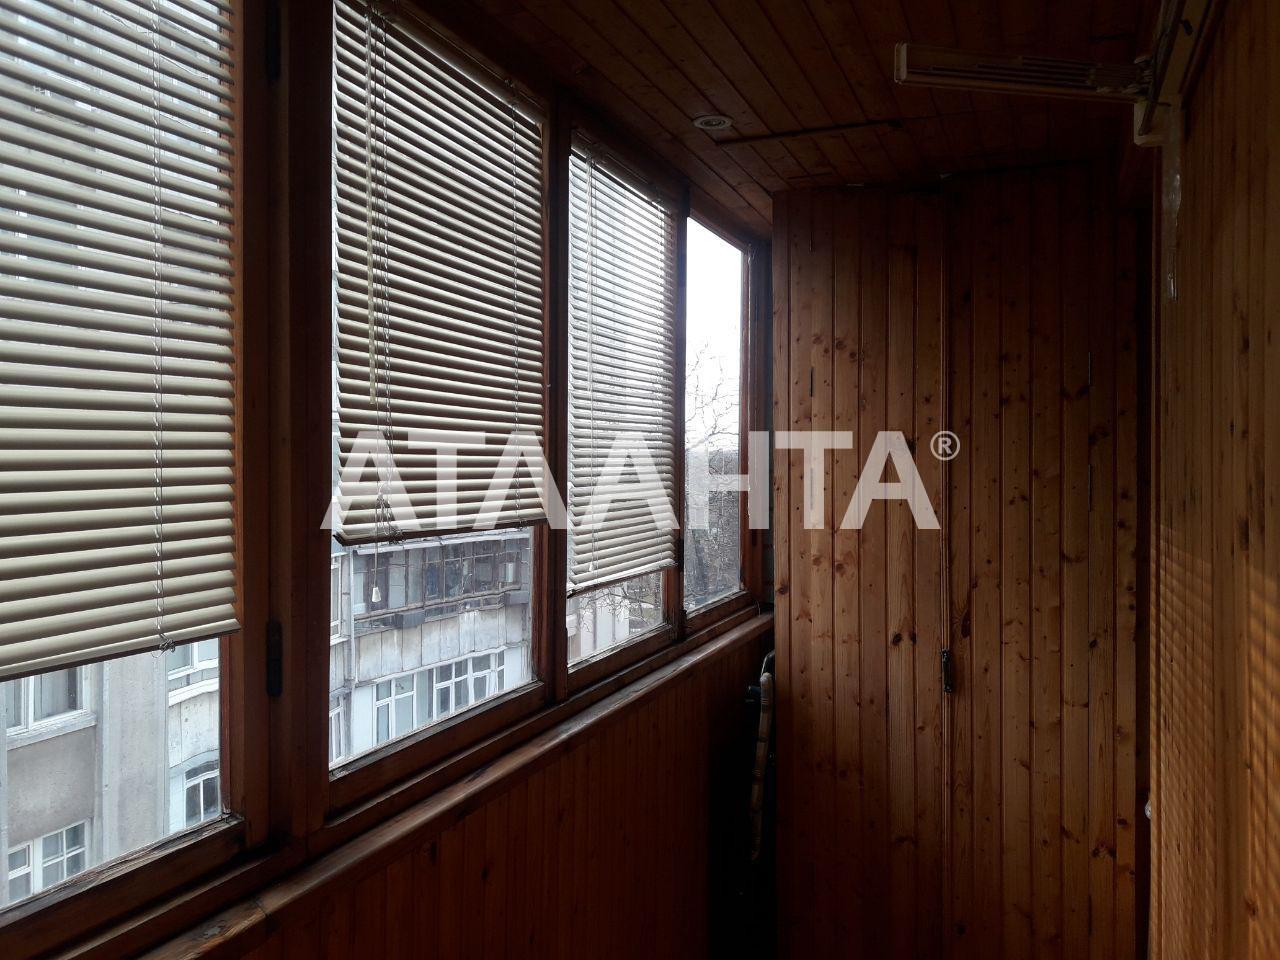 Продается 4-комнатная Квартира на ул. Посмитного — 68 000 у.е. (фото №5)